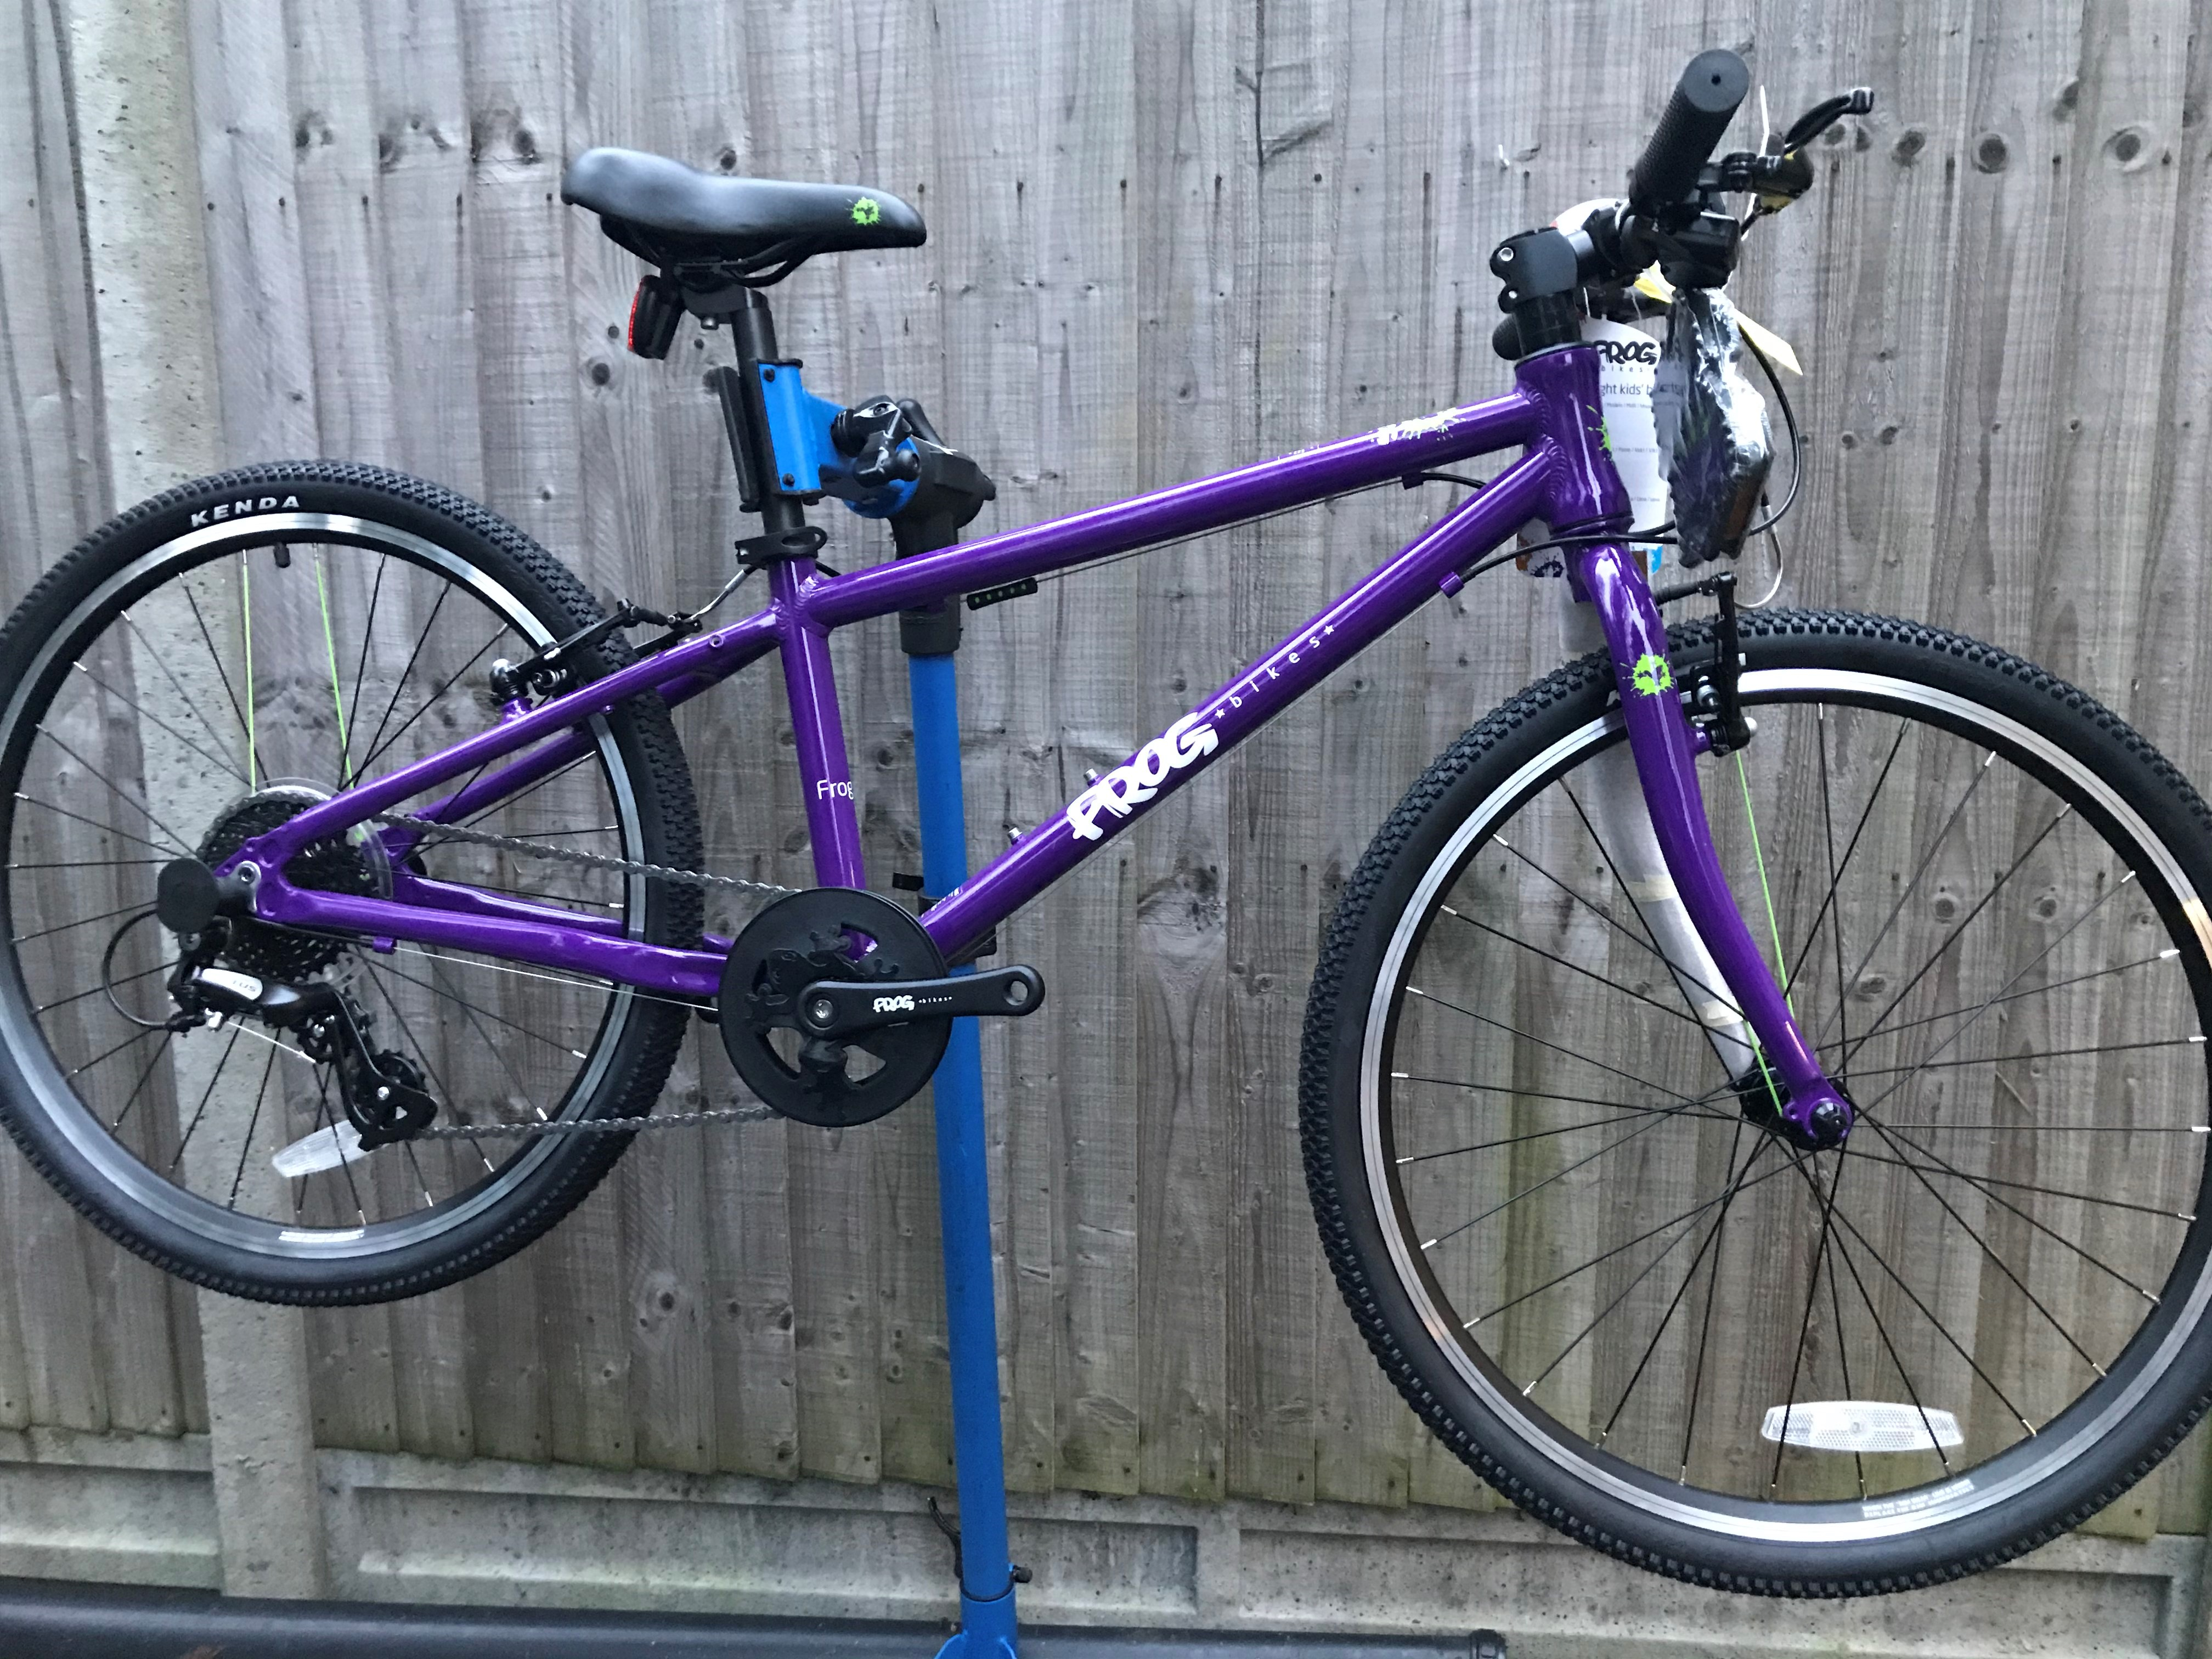 Frog 55 purple version